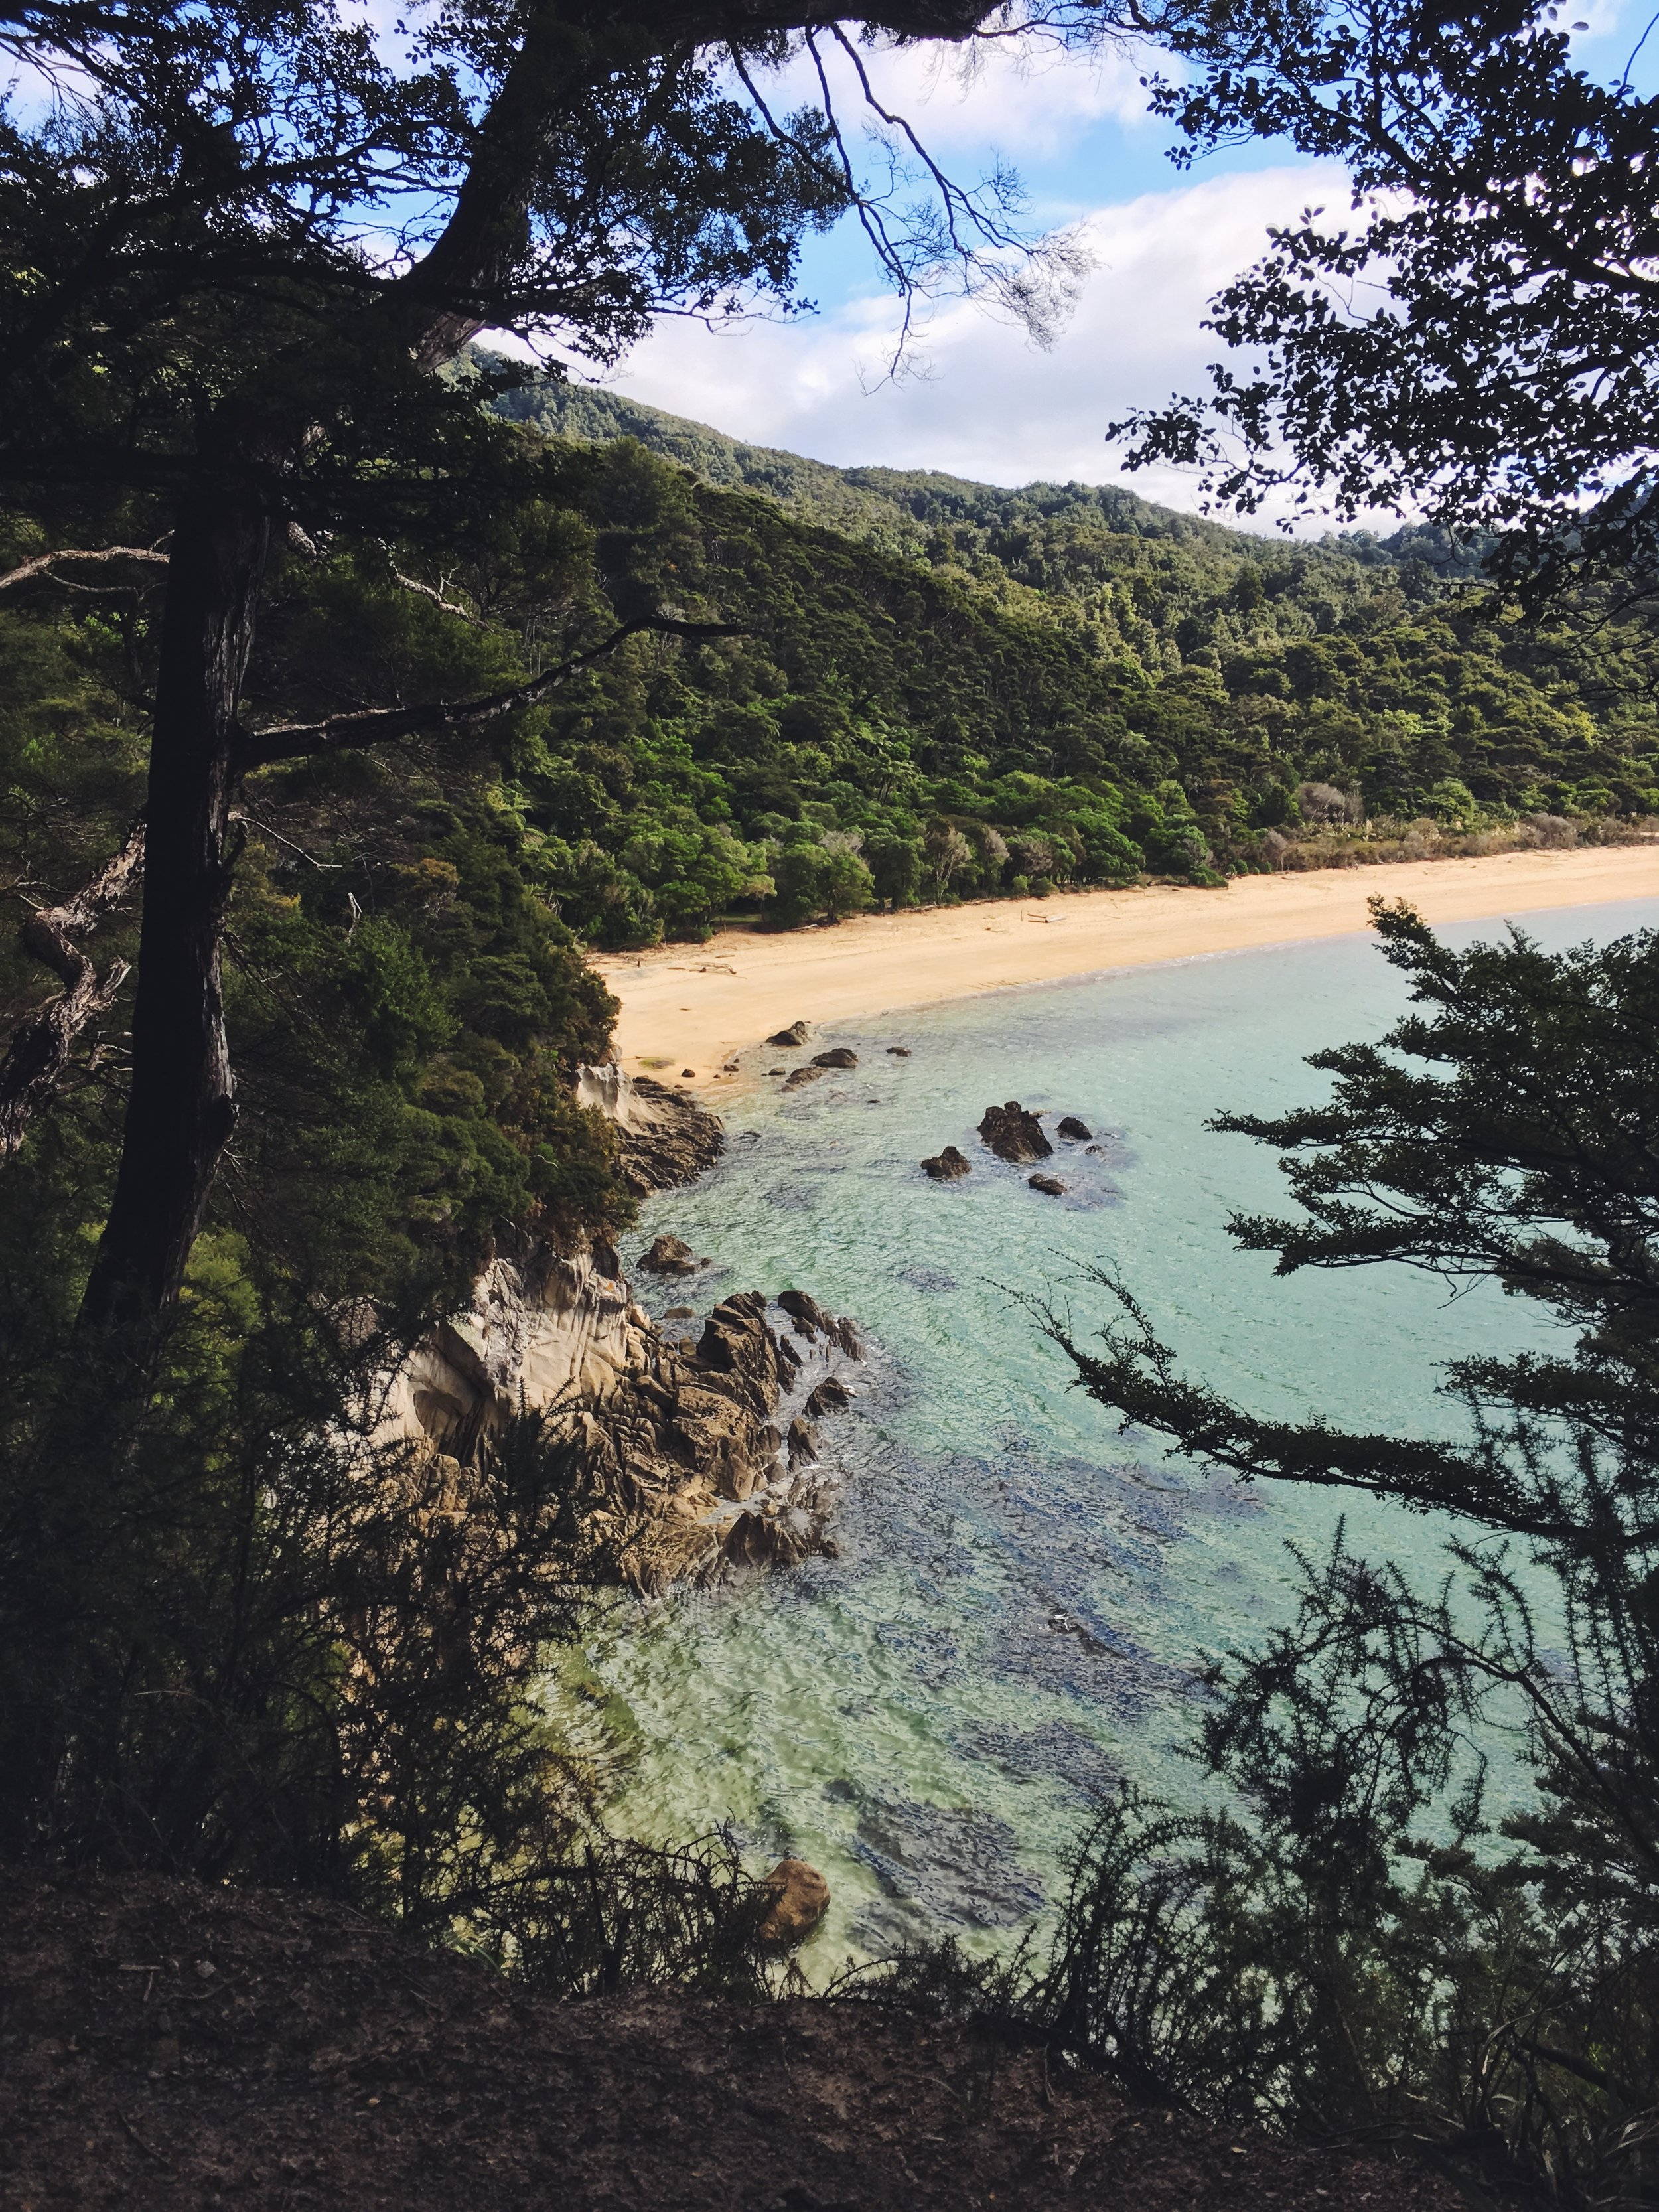 The first views of Onetahuti Beach, the final destination.